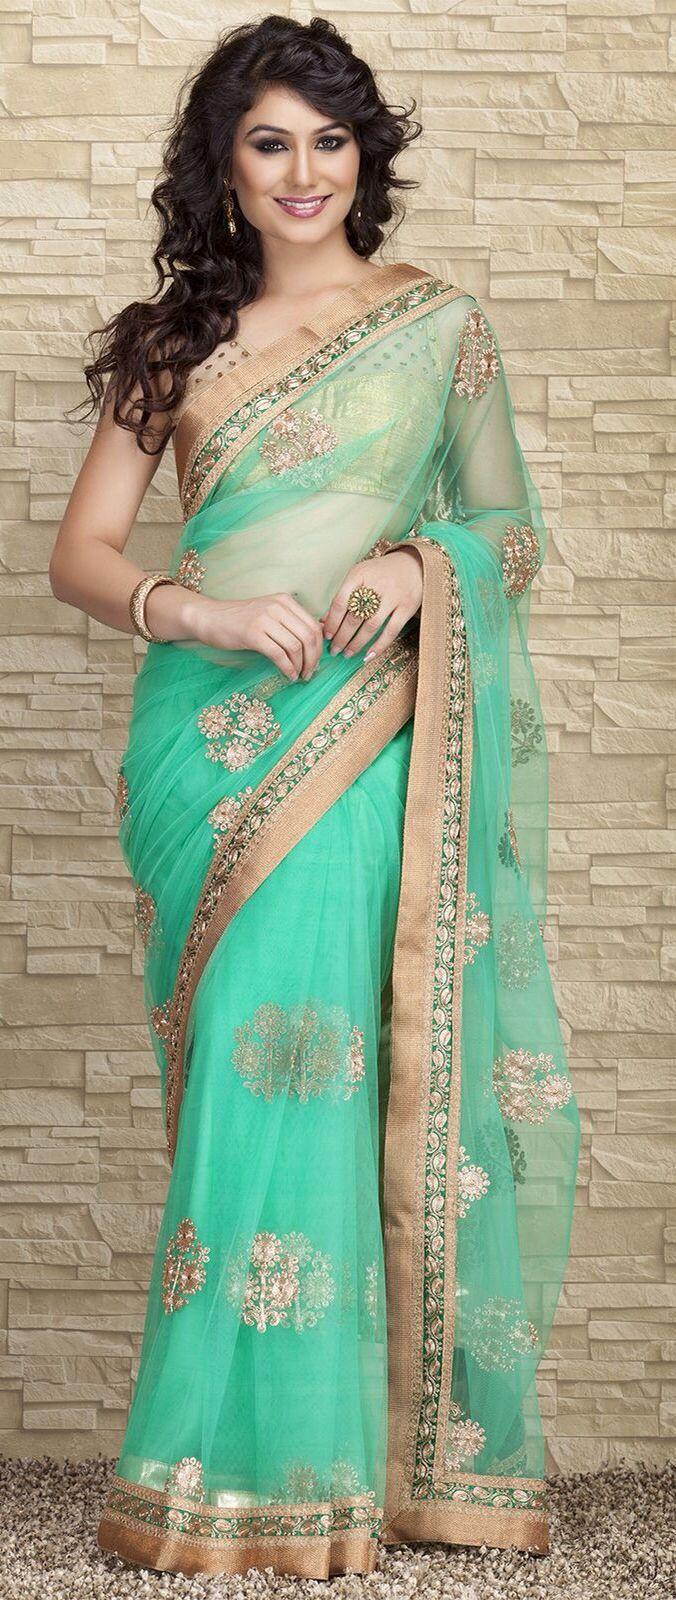 Pin by Chandresh Davara on Blouse designs   Pinterest   Saree, Saris ...